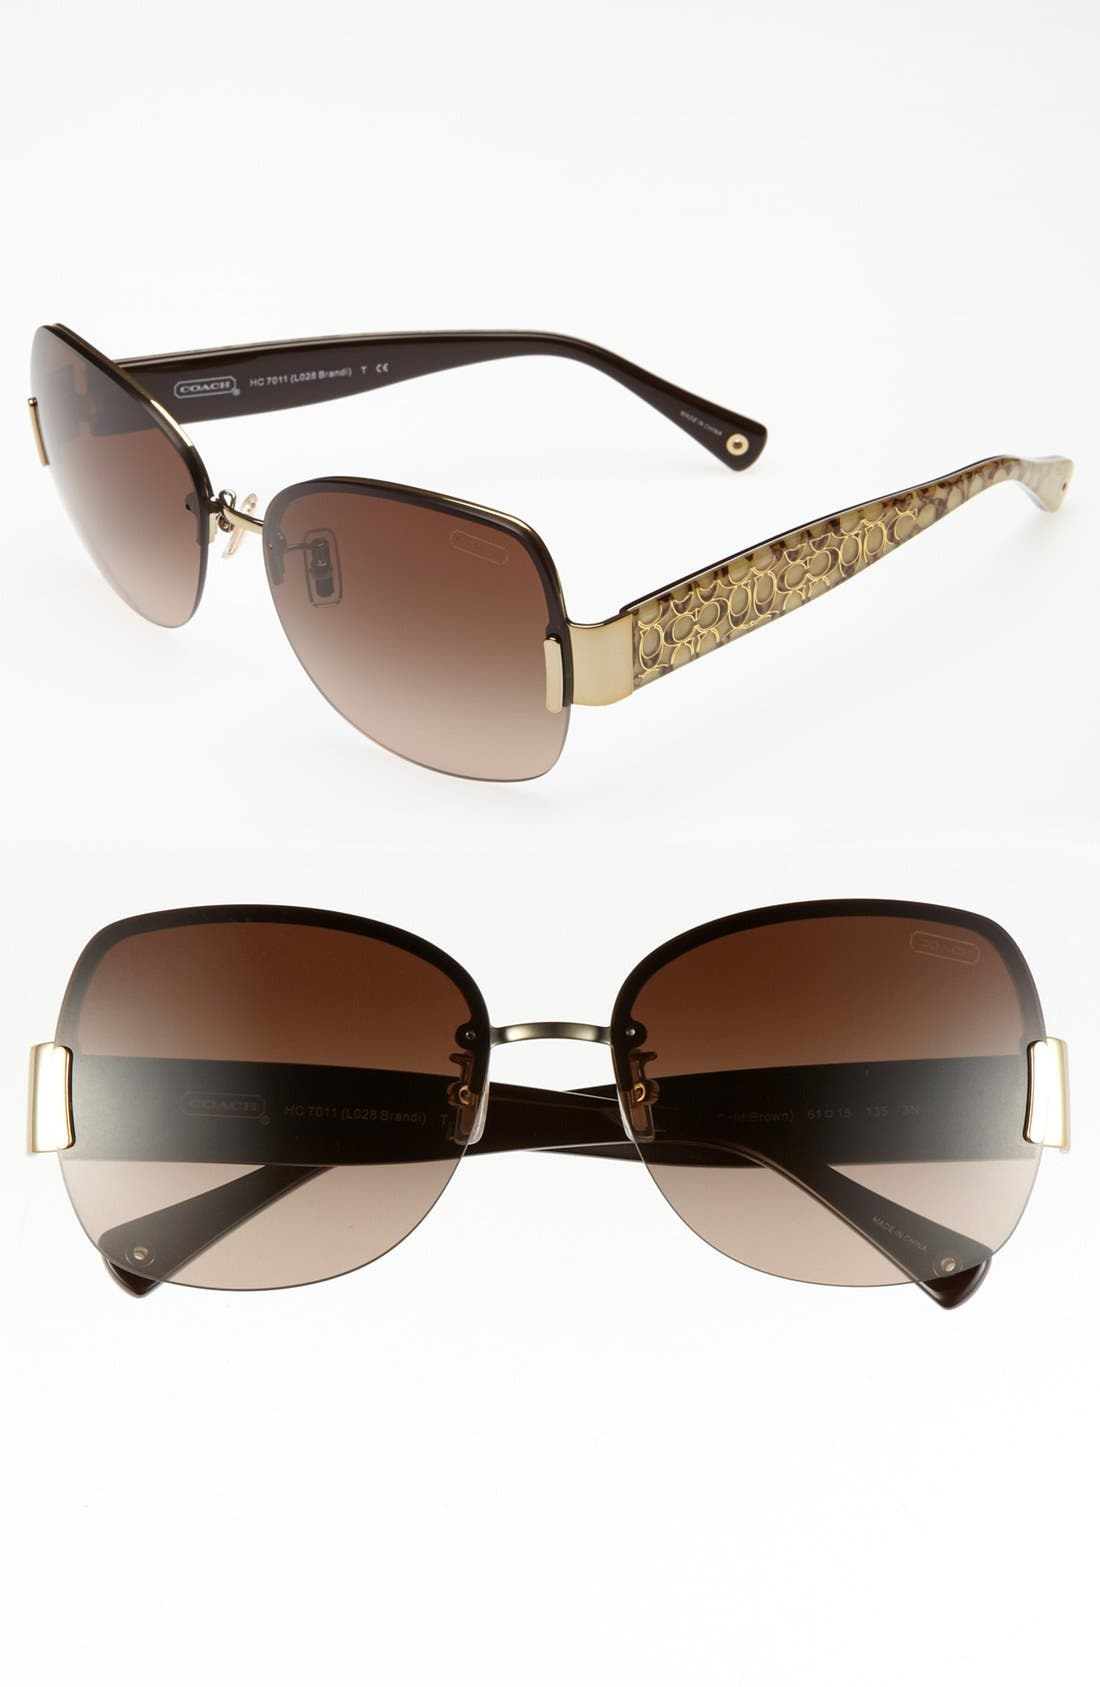 Main Image - COACH 61mm Rimless Sunglasses